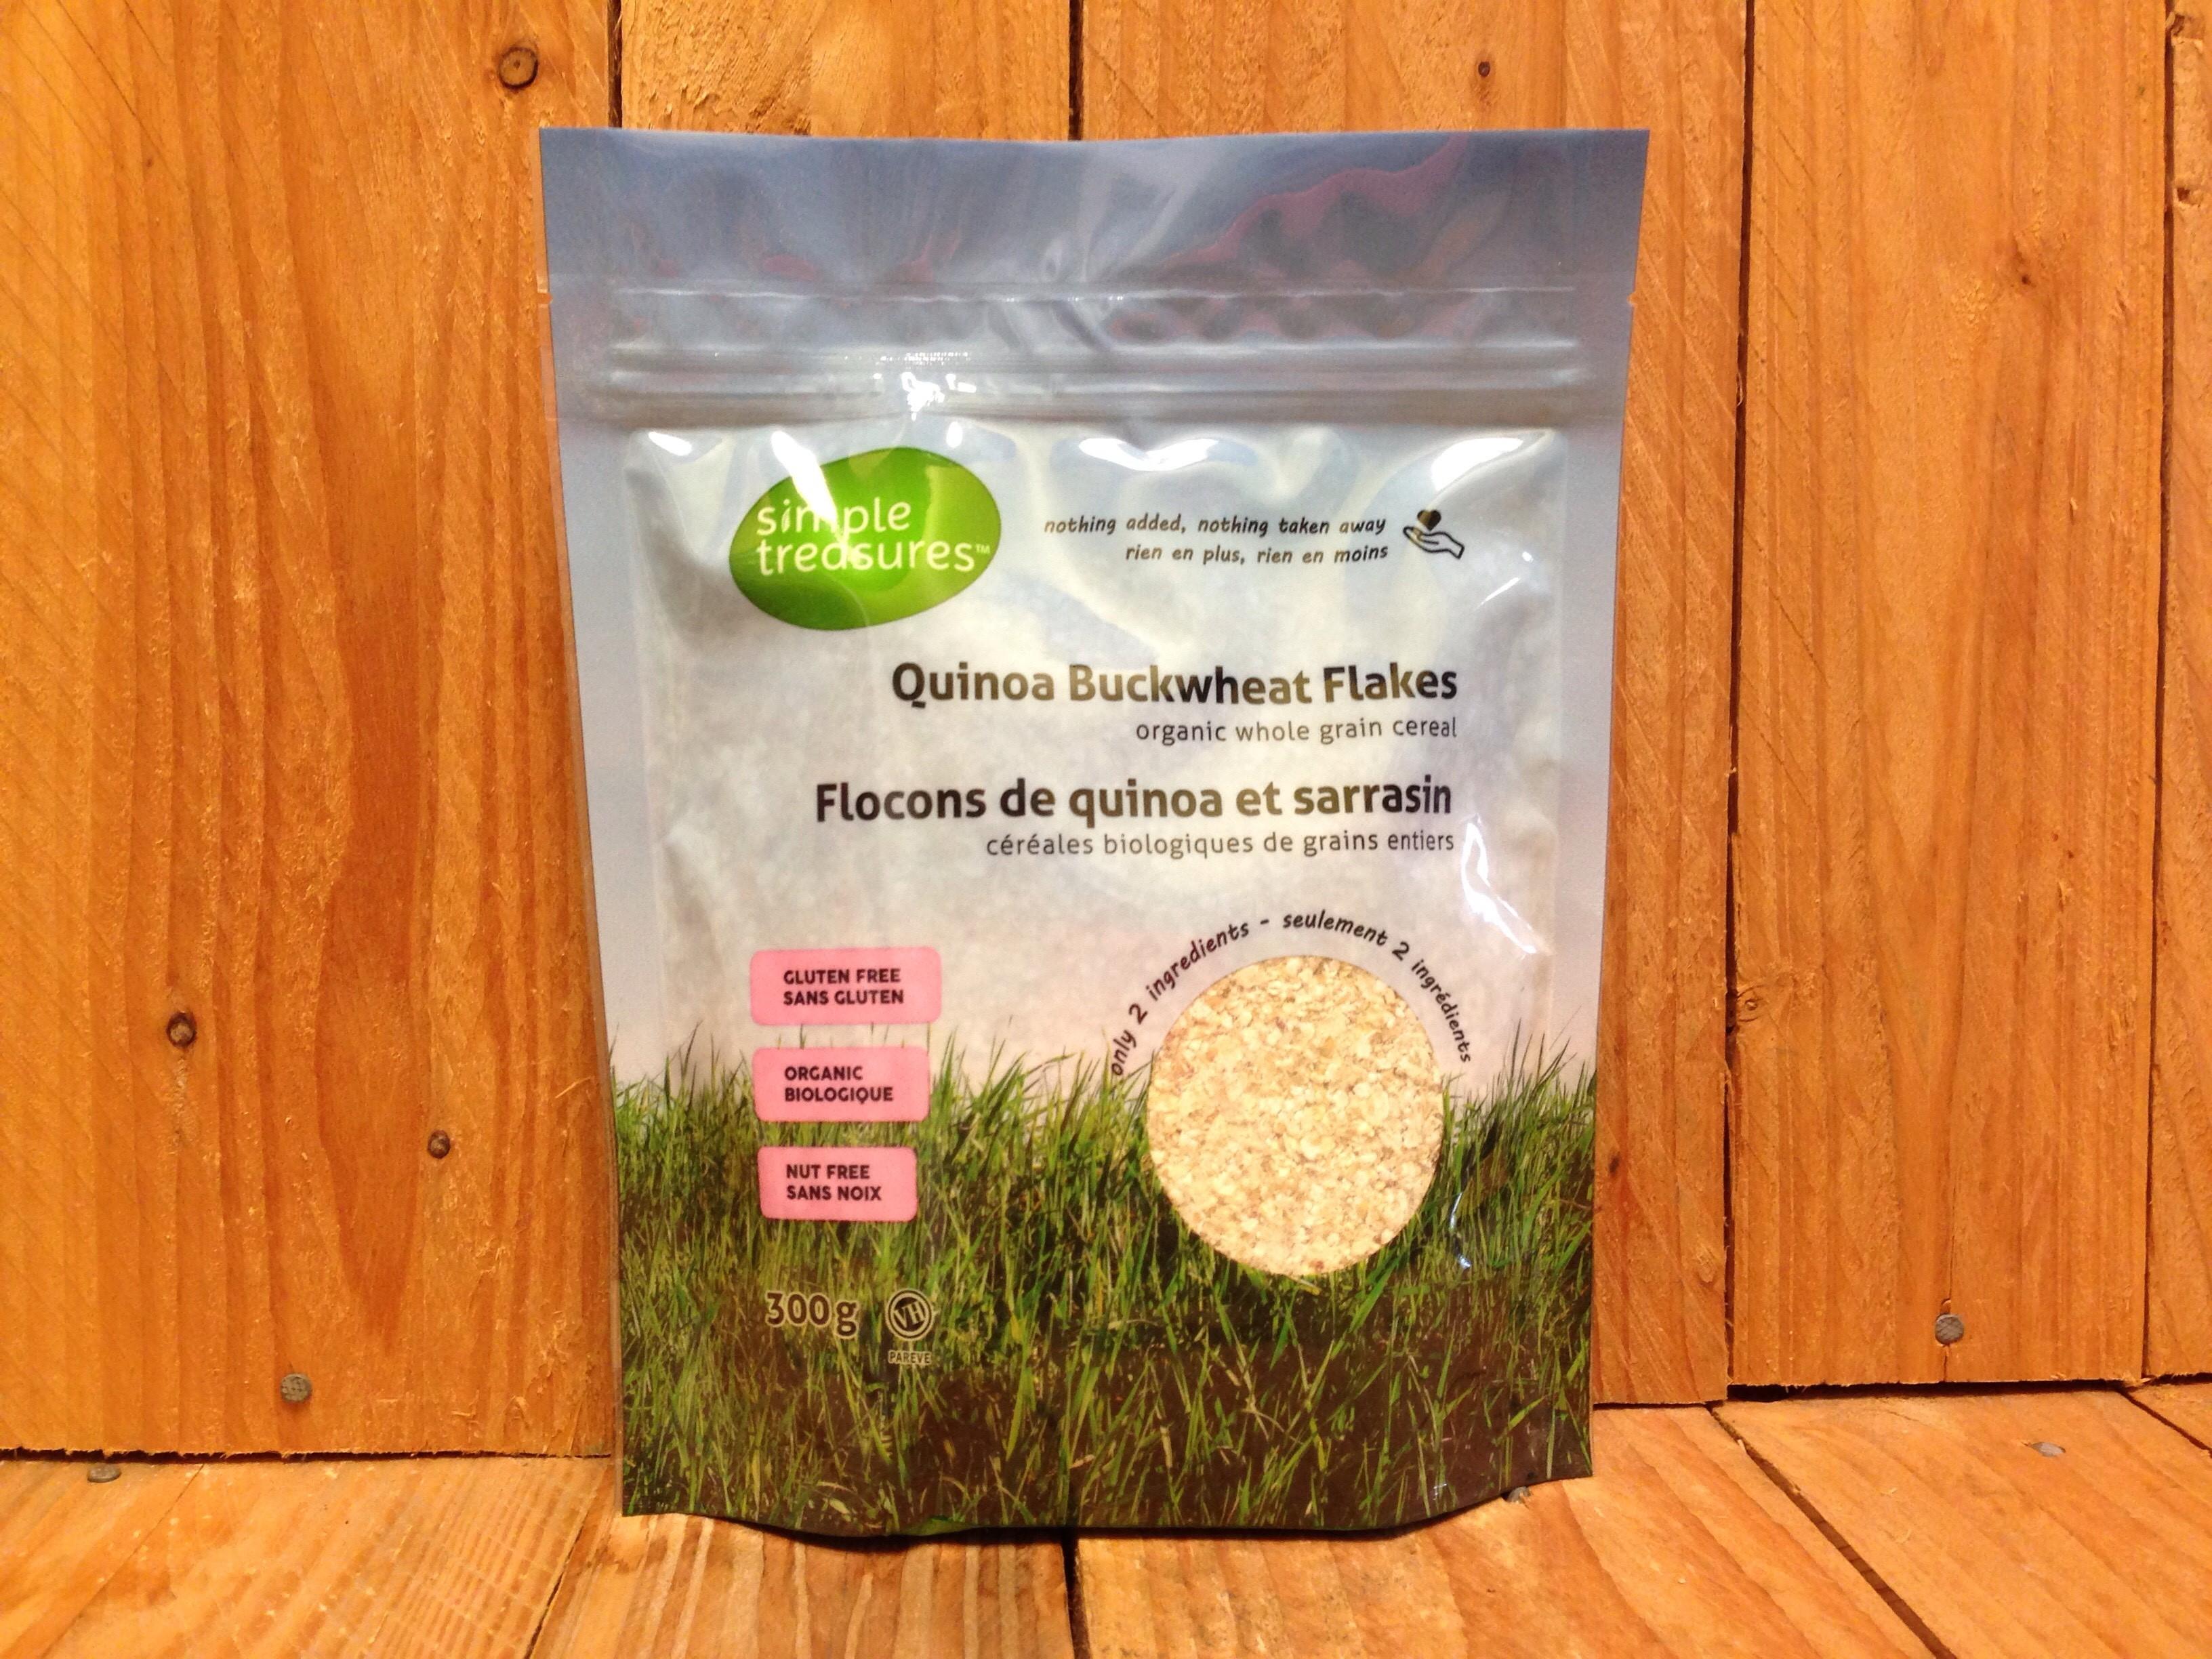 Simple Treasures – Quinoa Buckwheat Flakes – Whole Grain Cereal (300ml)